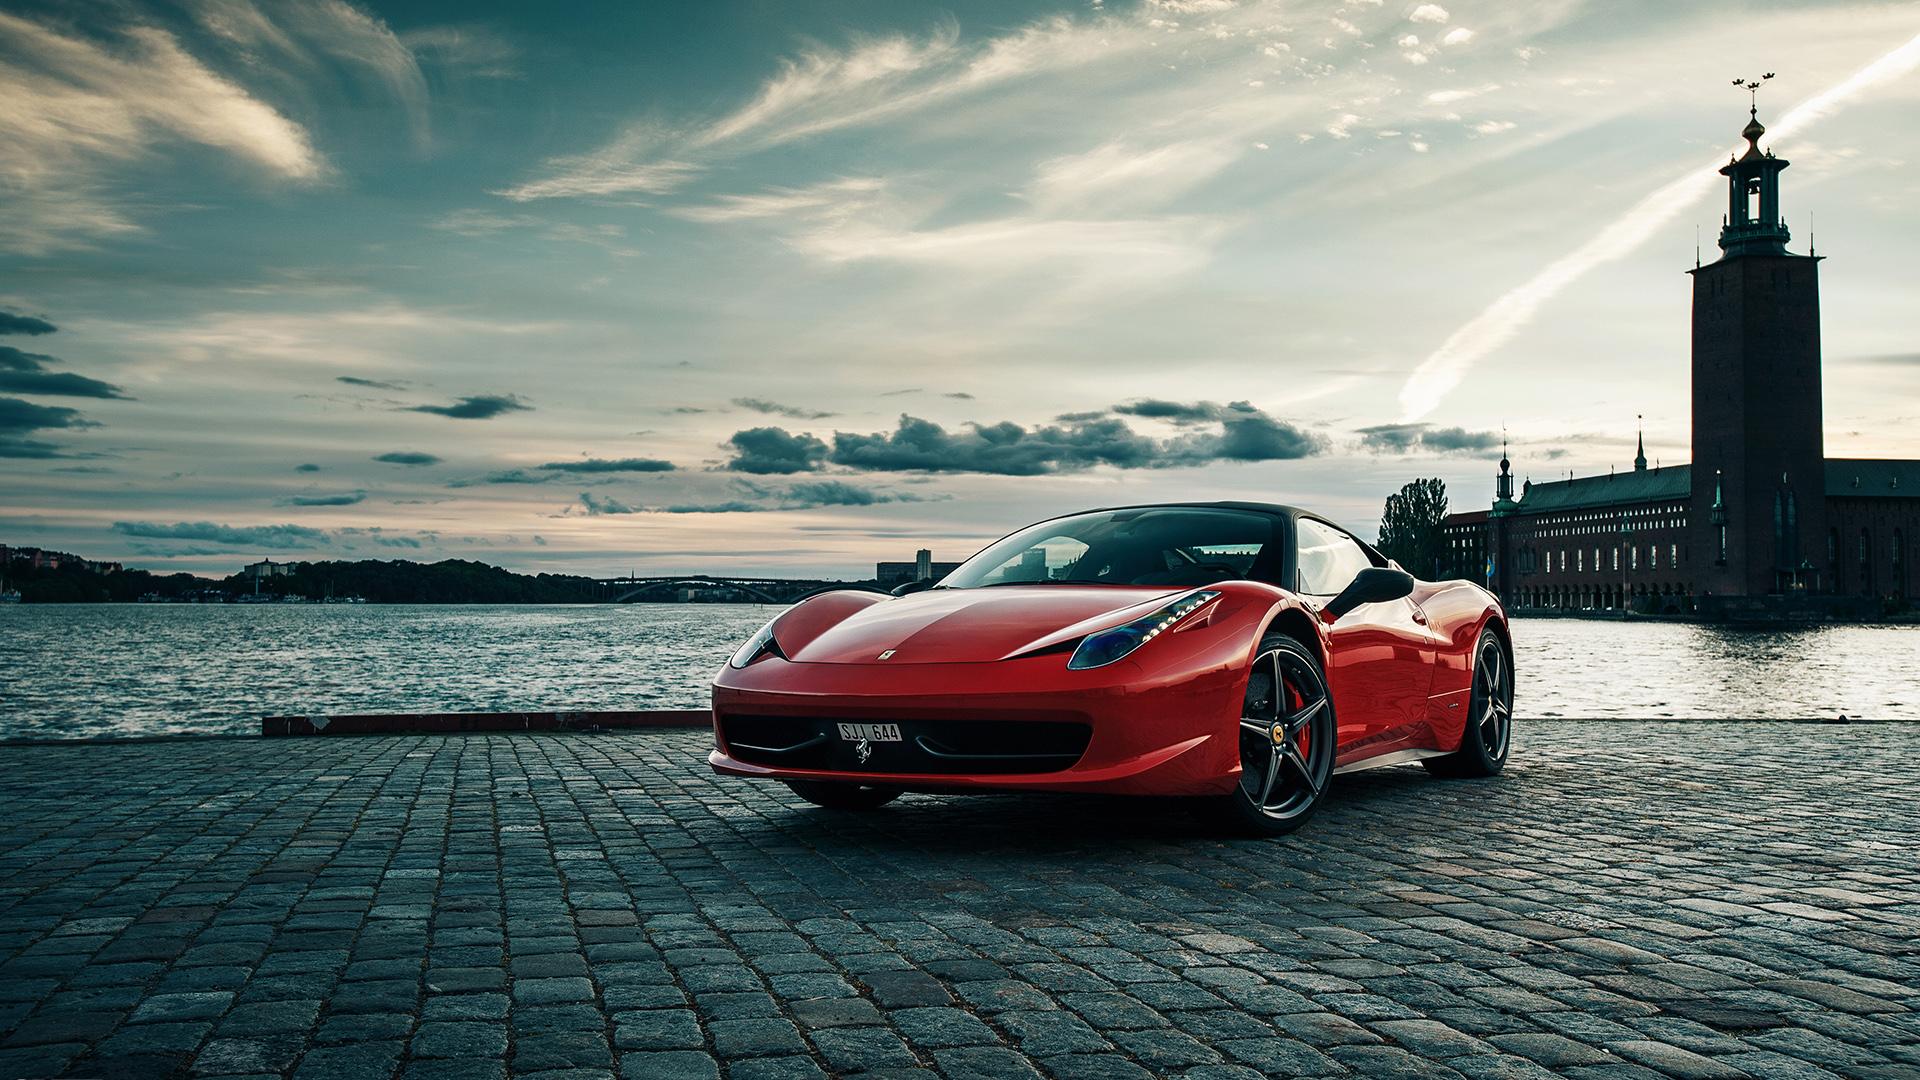 Ferrari 458 Italia Hd Wallpaper Wallpapersafari